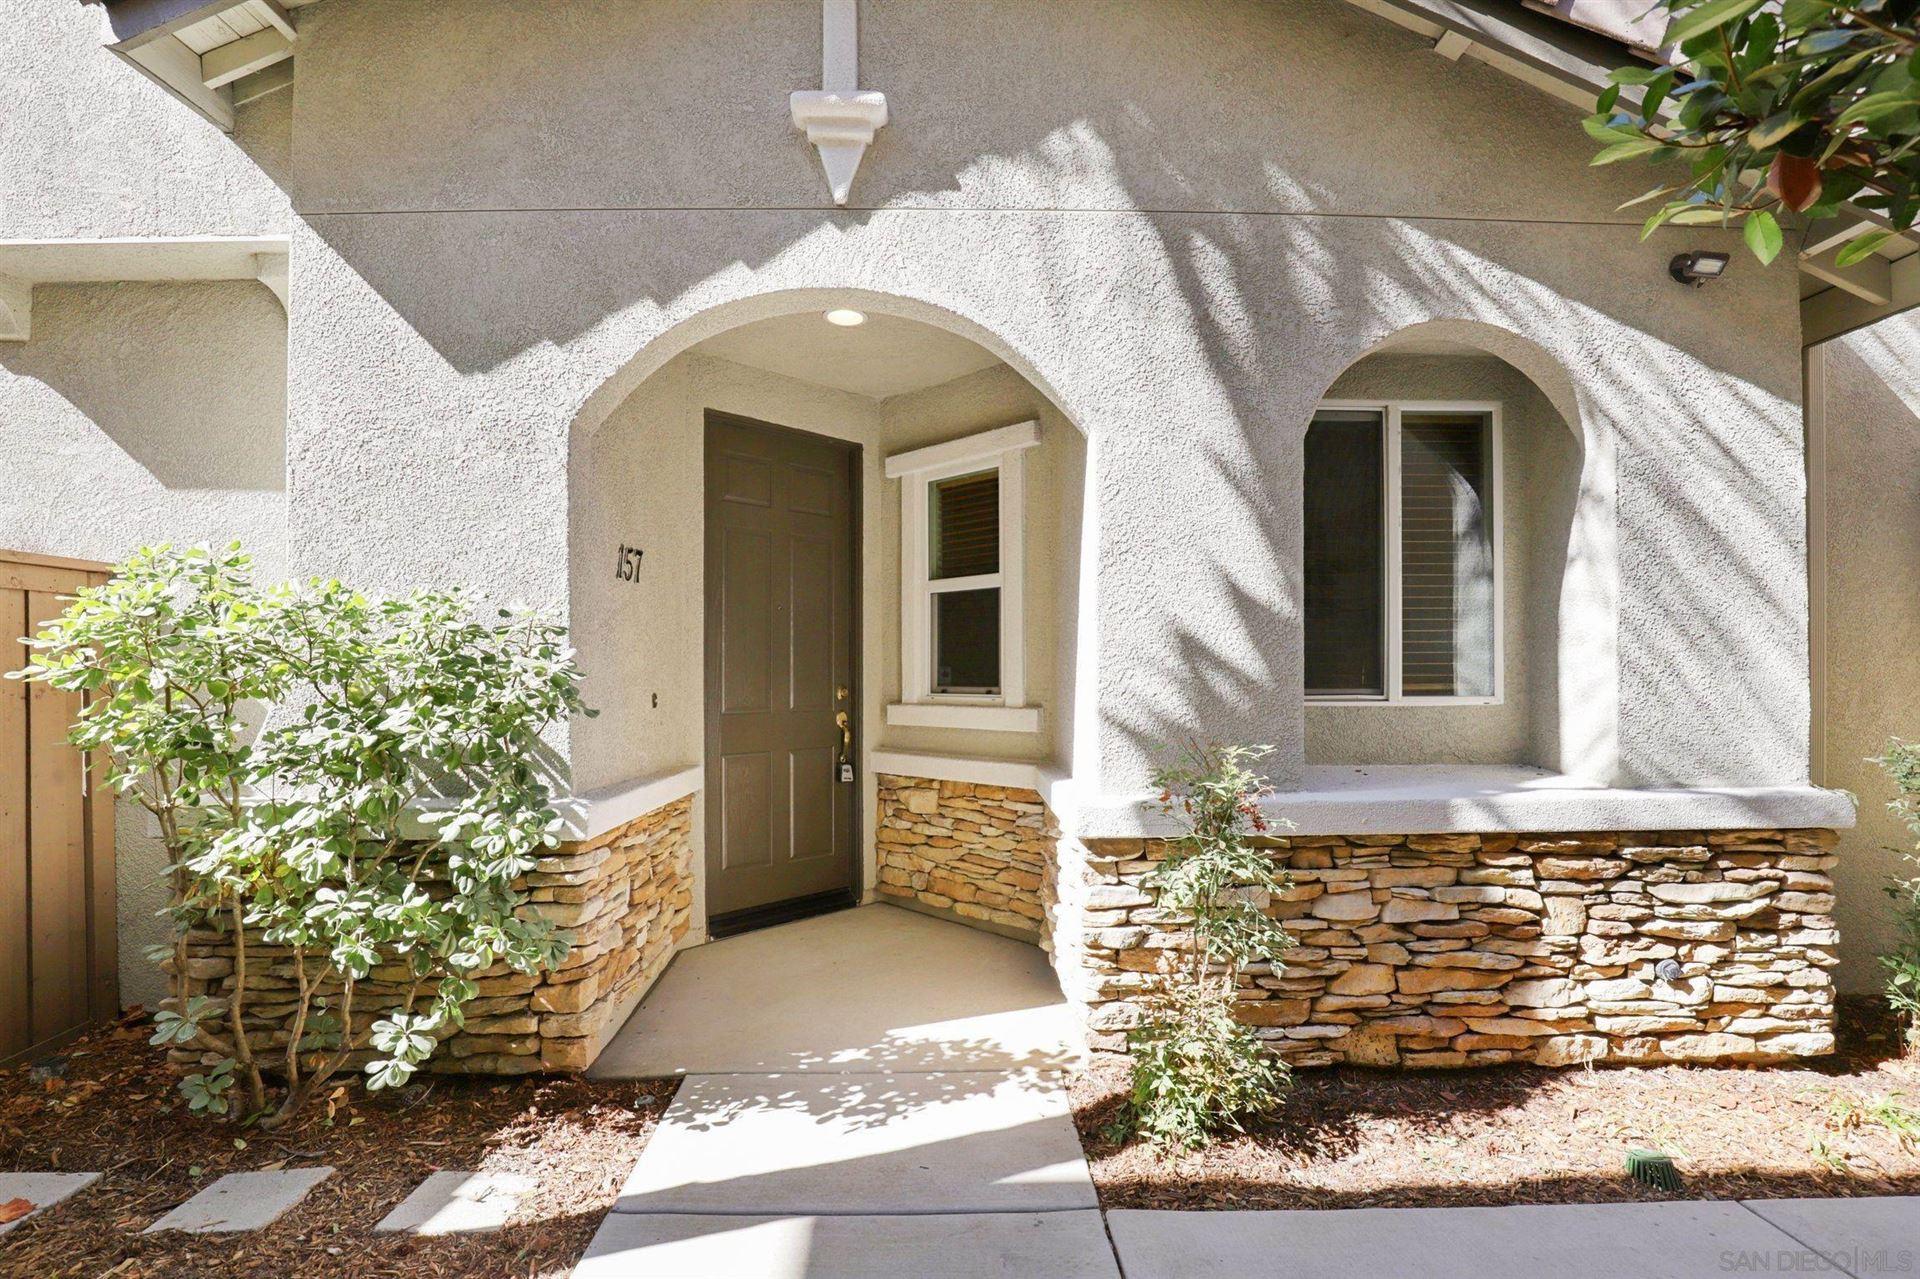 425 S Meadowbrook Dr #157, San Diego, CA 92114 - #: 210029344